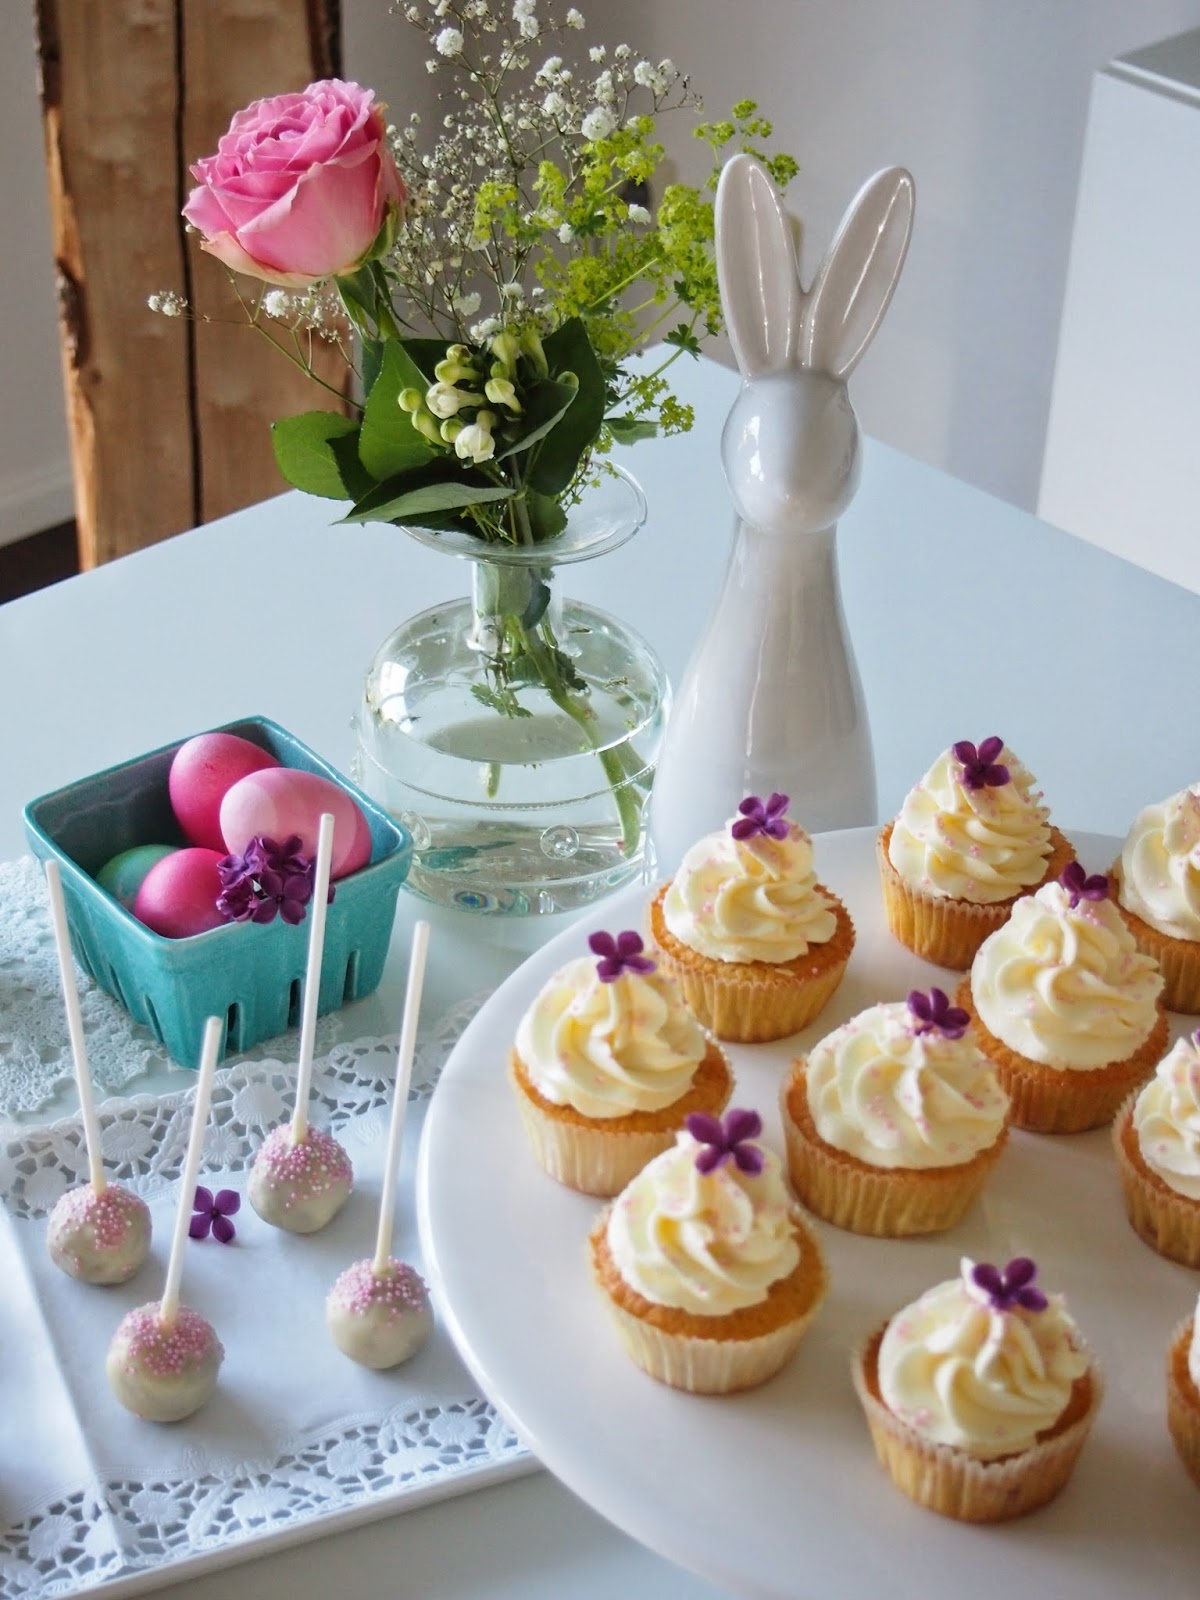 dieZuckerbäckerei: Rhabarber-Prosecco-Cupcakes und Mohn ...